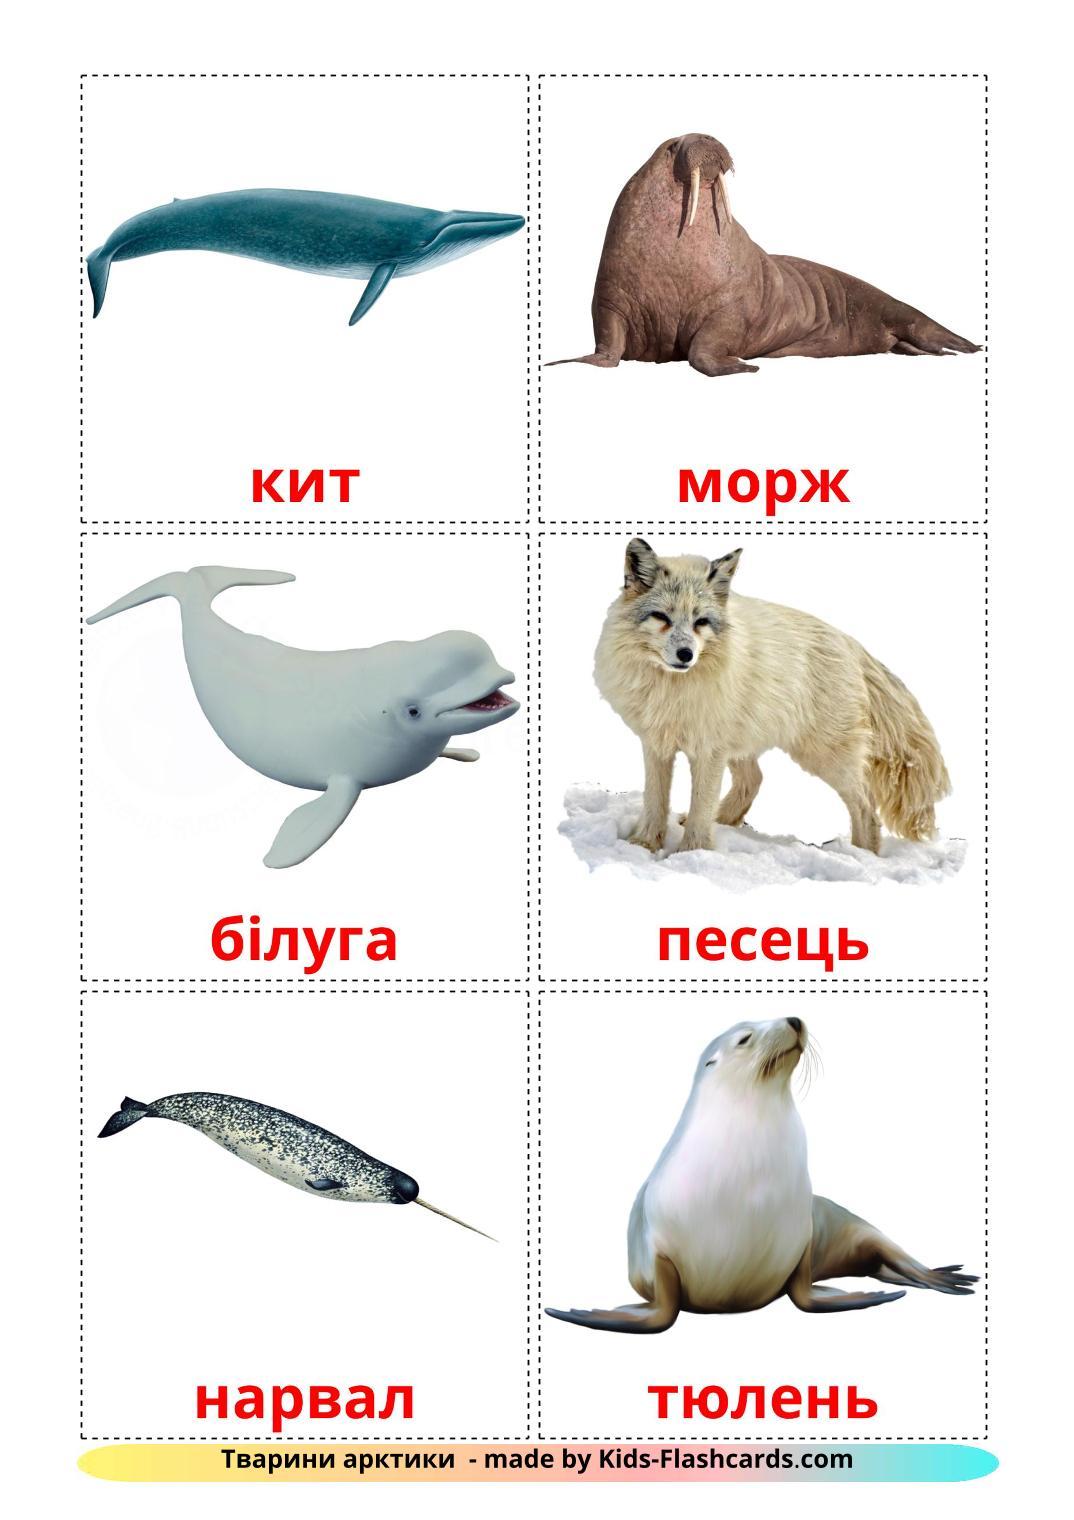 Arctic animals - 14 Free Printable ukrainian Flashcards